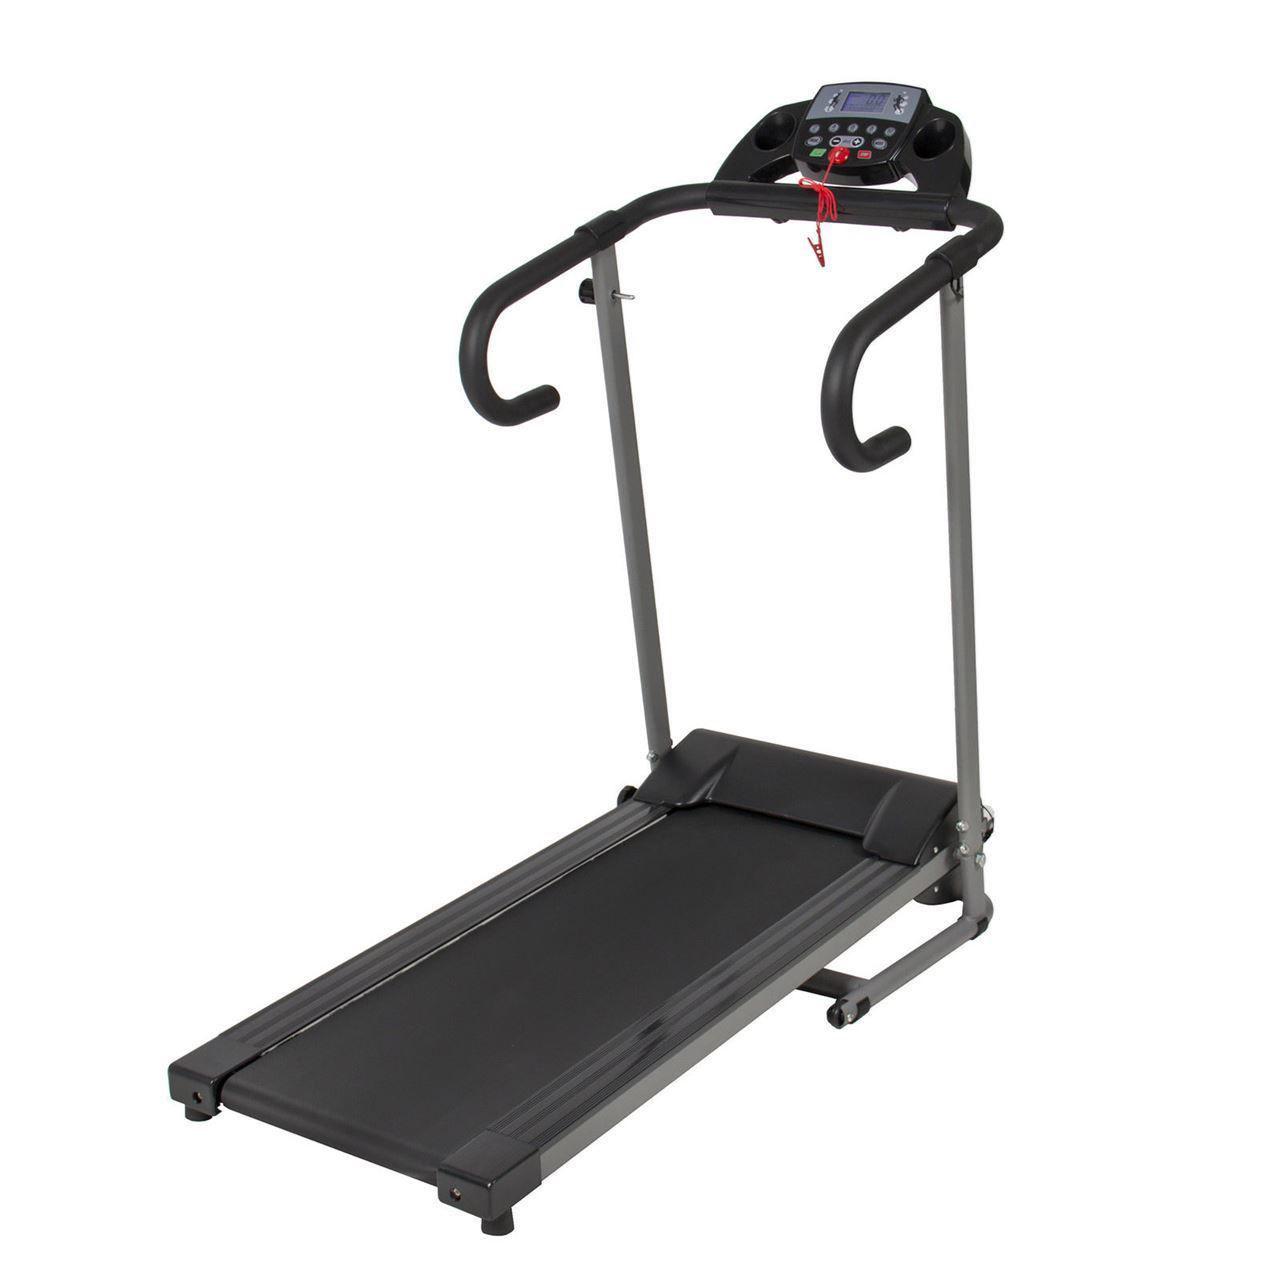 Picture of 1100W Folding Electric Portable Treadmill Orange